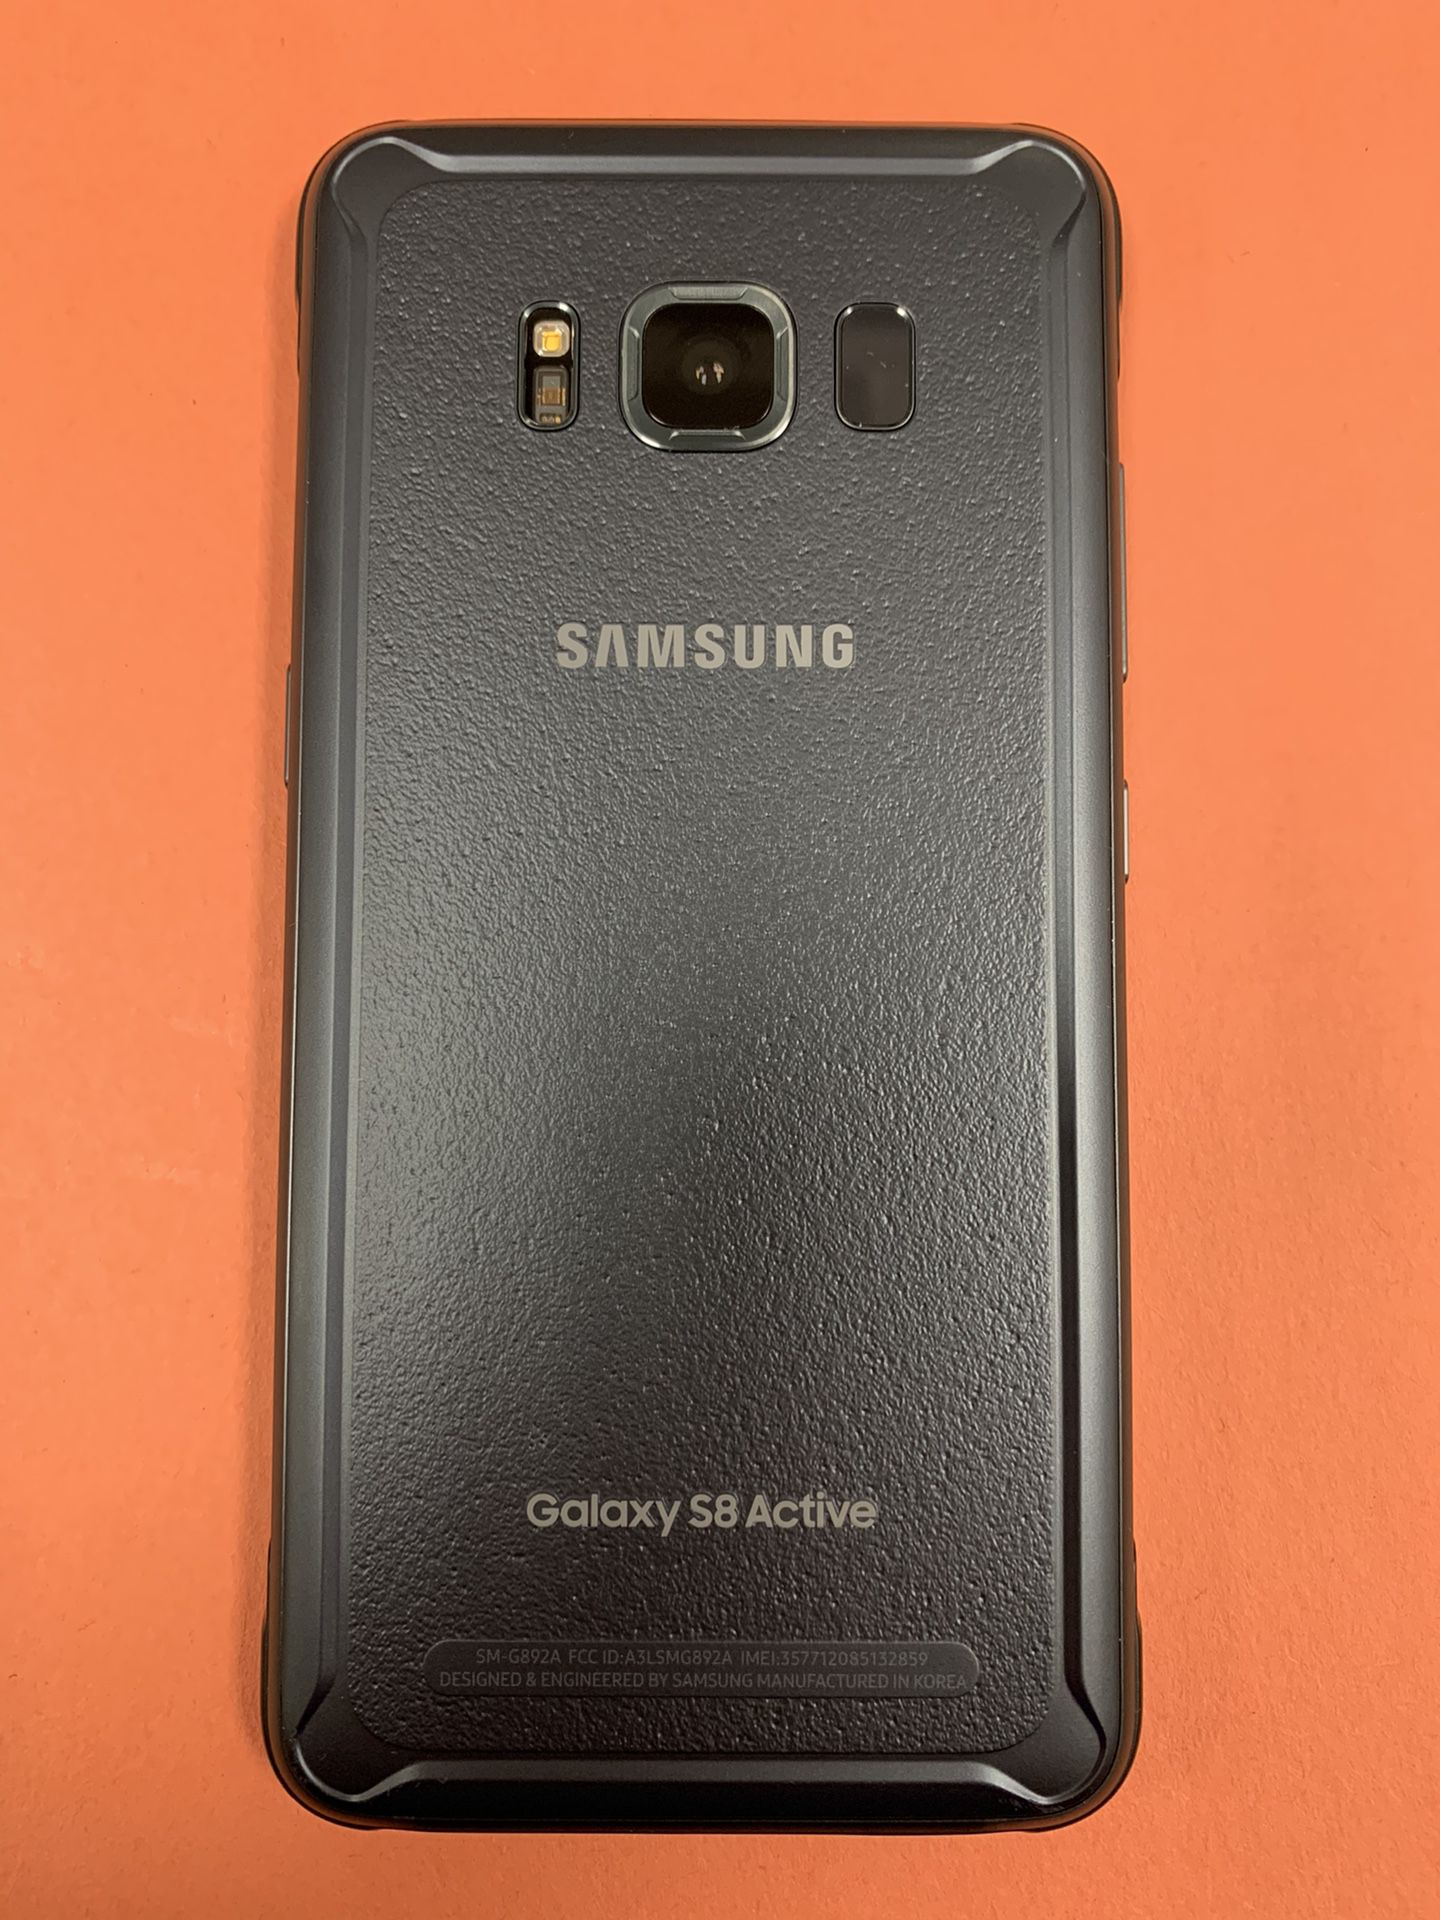 Samsung S8 Active 64 GB Factory Unlocked